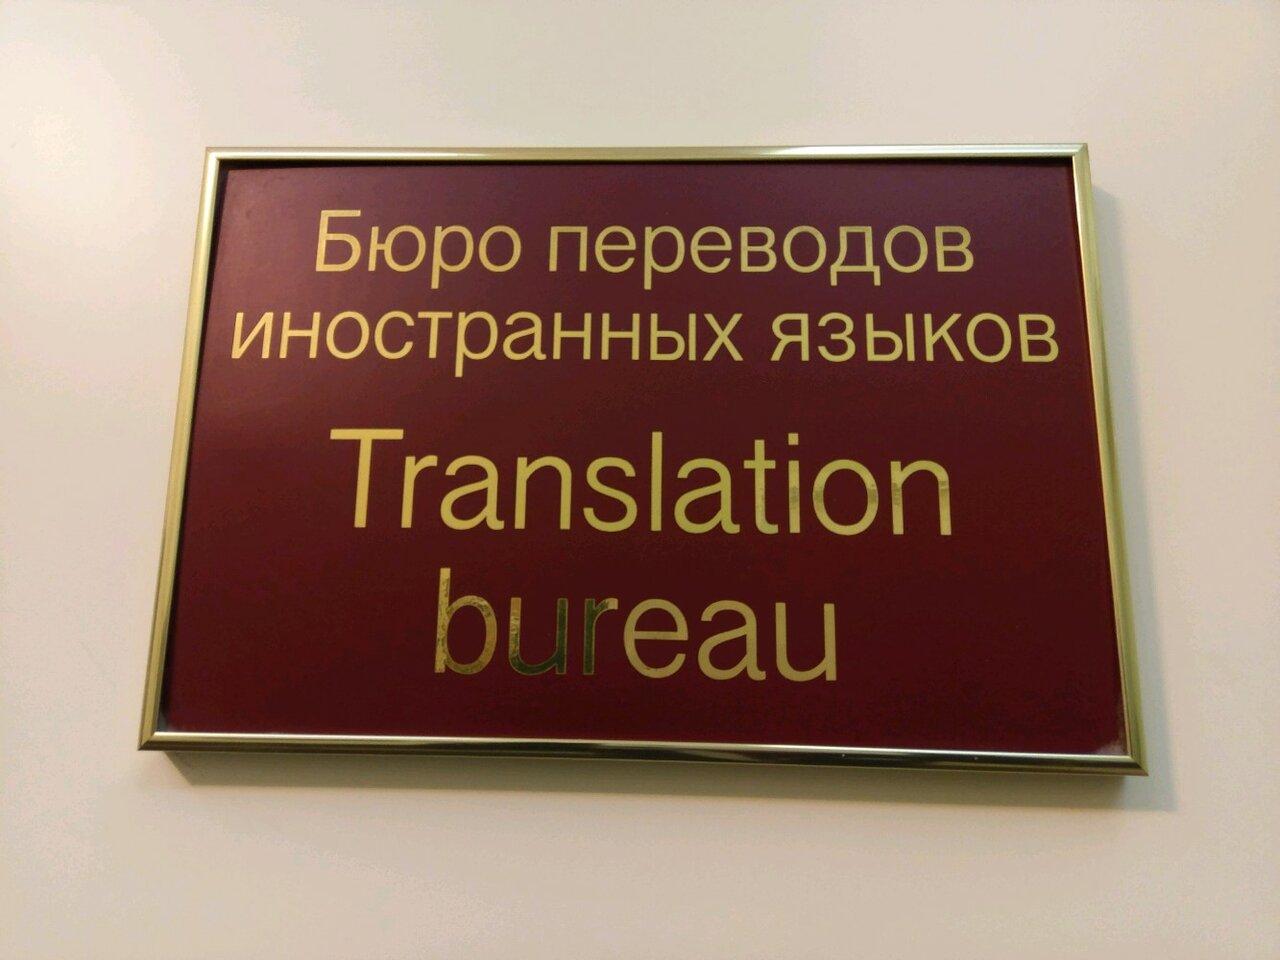 Бюро переводов картинки